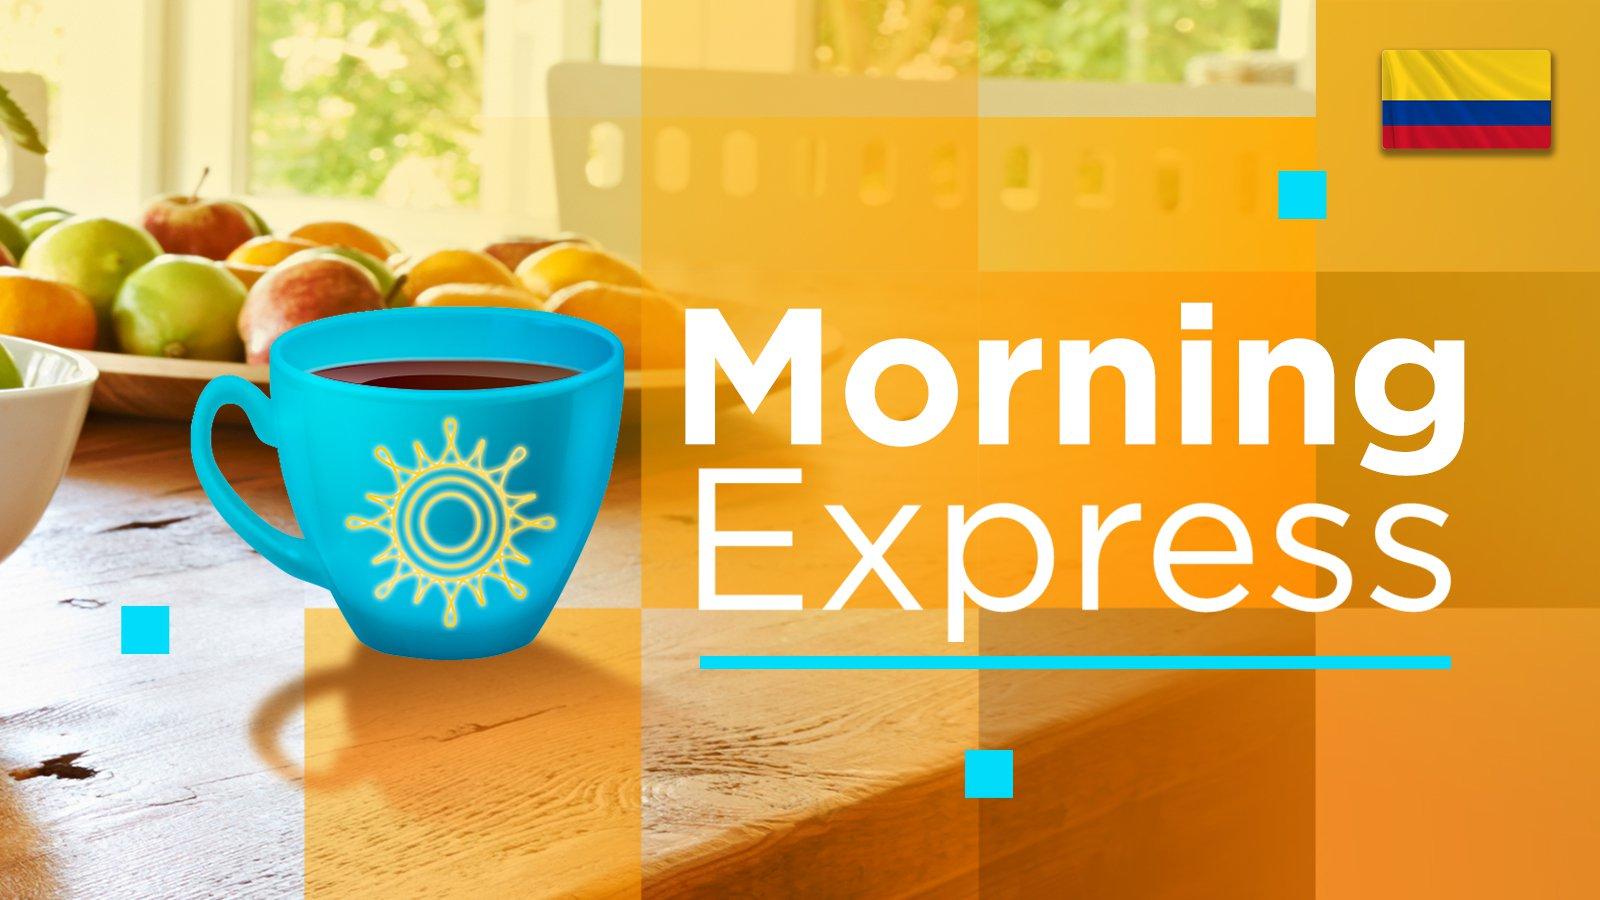 Morning Express poster